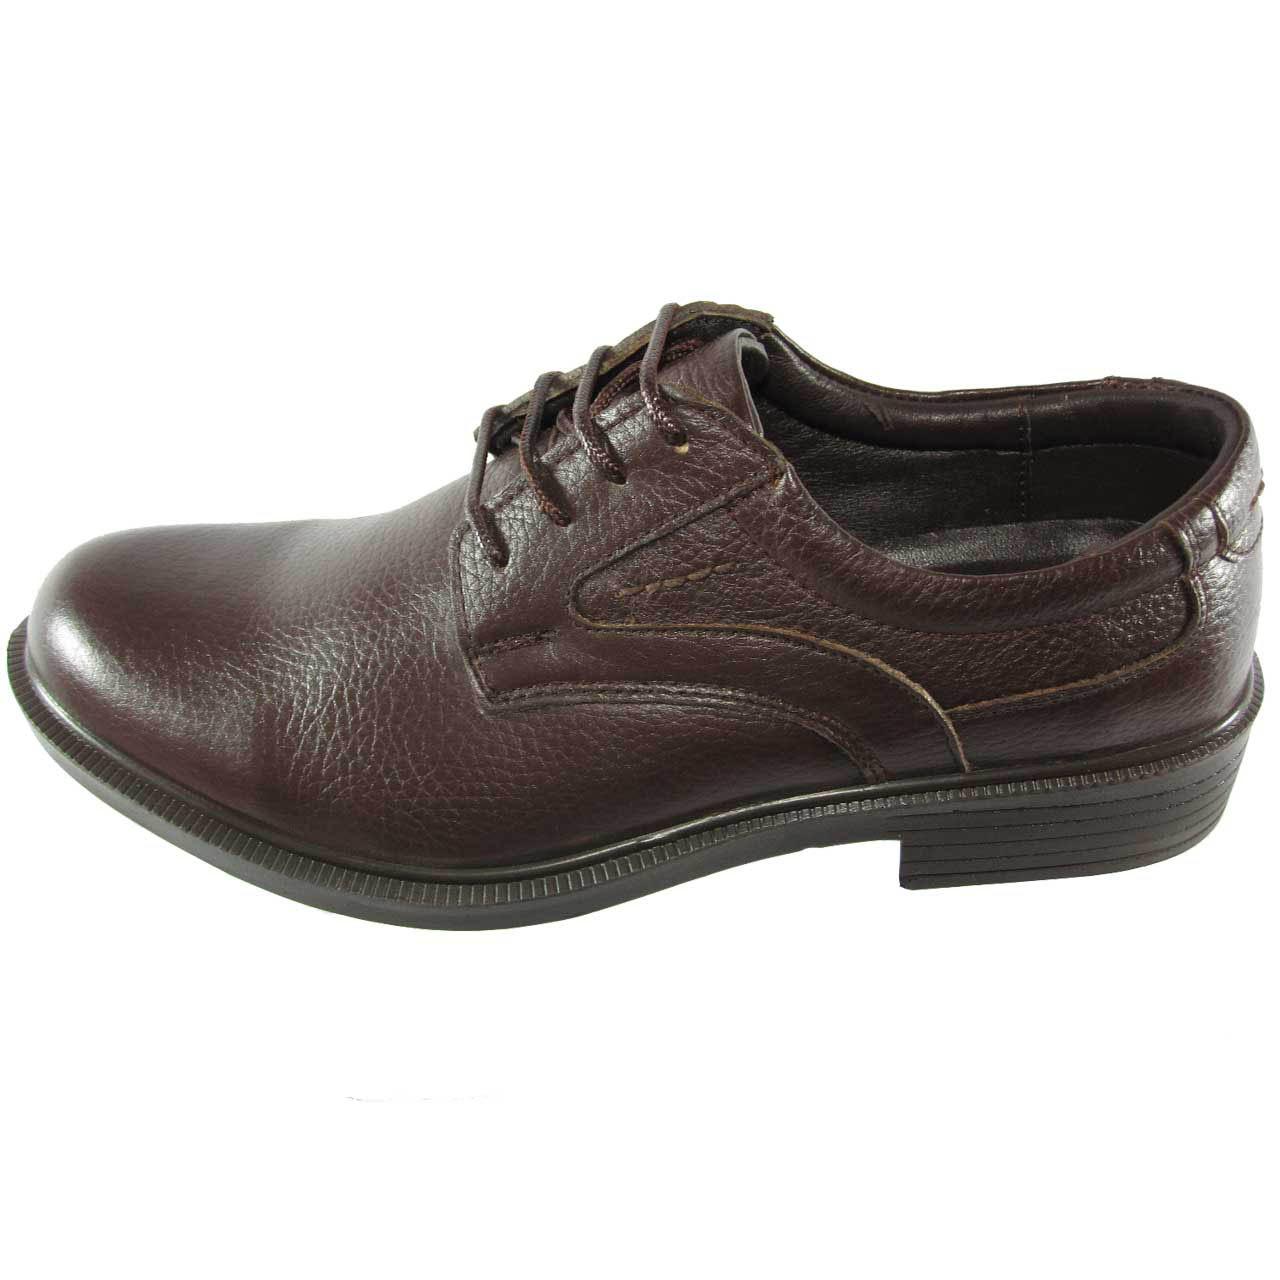 کفش مردانه پادوکا مدل Diplomat کد 1224